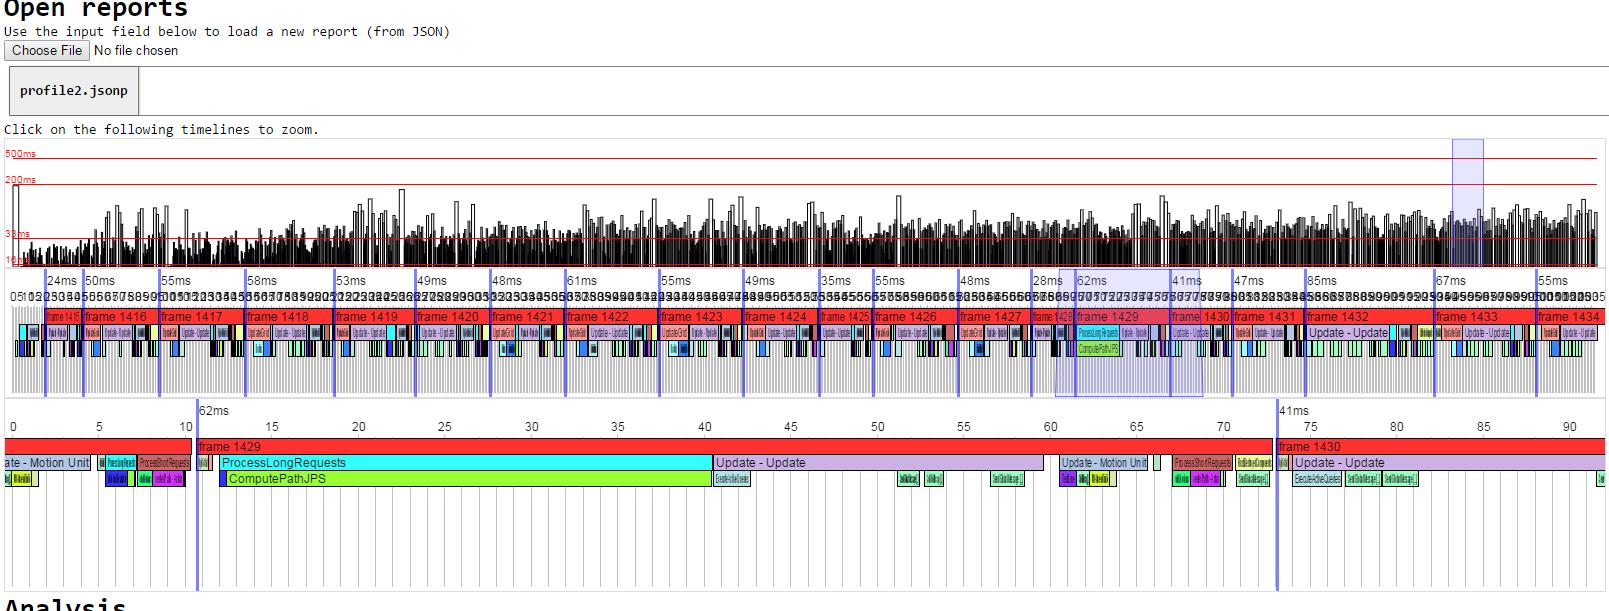 https://trac.wildfiregames.com/raw-attachment/wiki/Profiler2/report-timeline.PNG